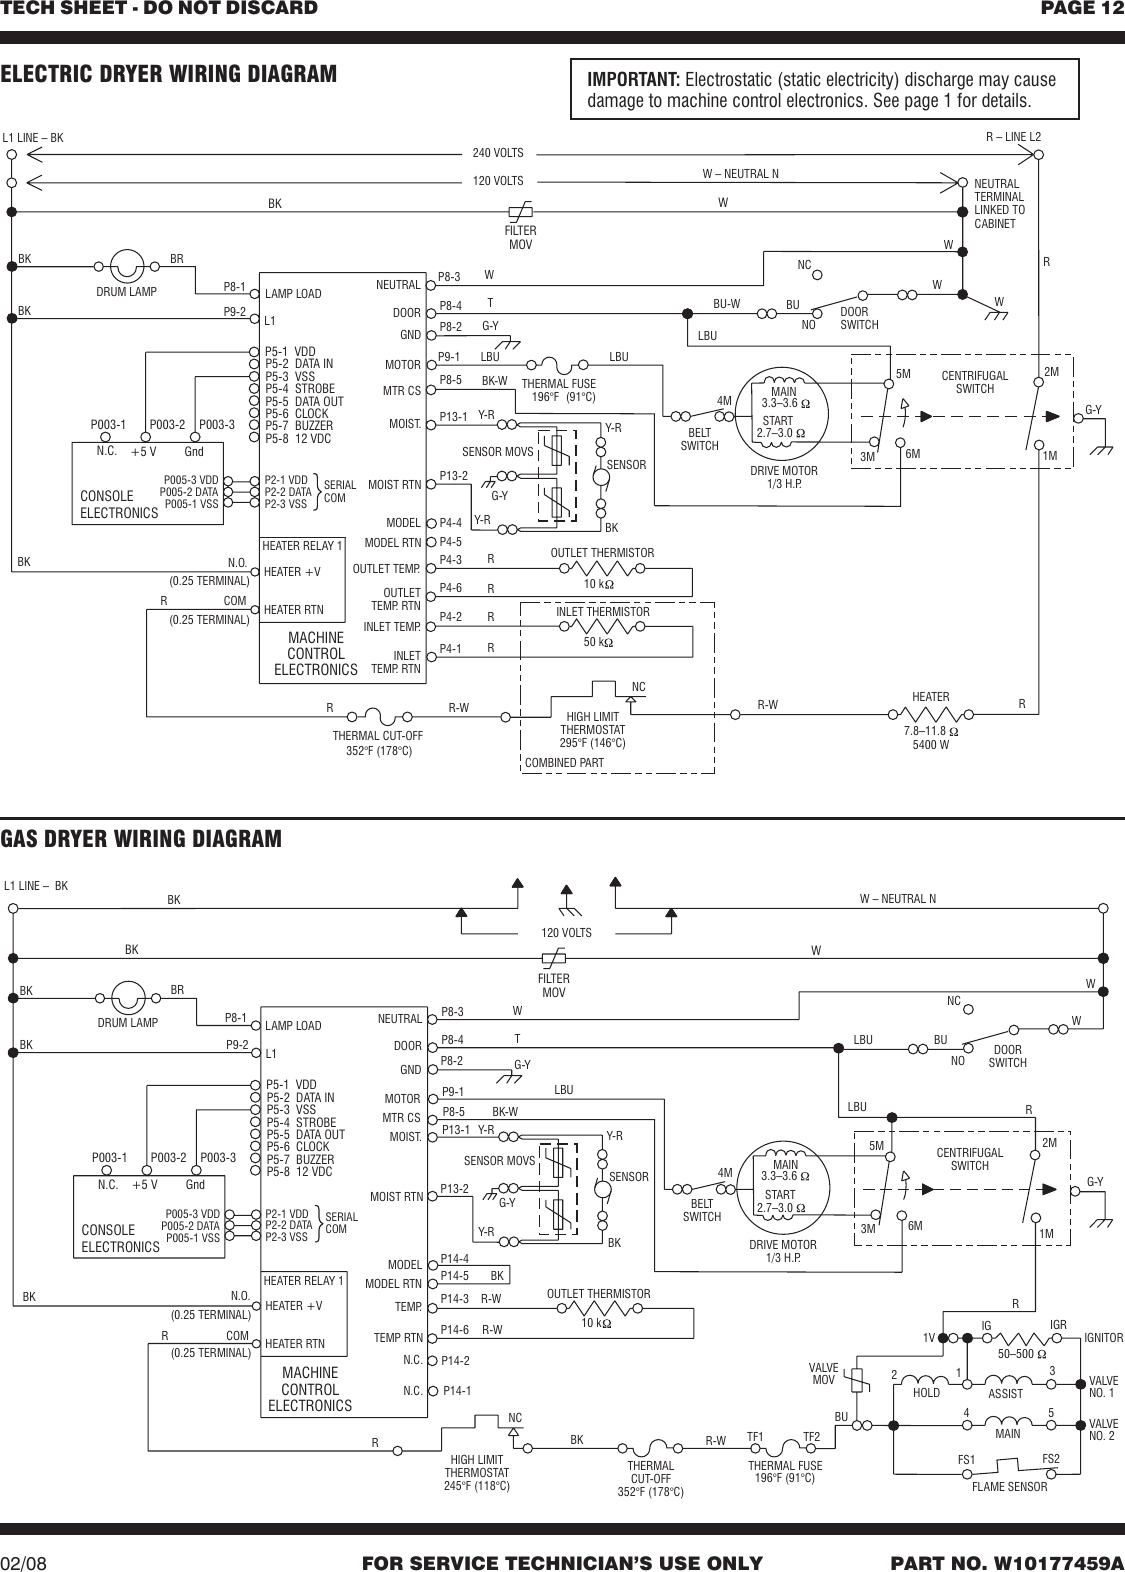 Zb80281 W10177459avp W10177459a Whirlpool Duet Sport Dryer Tech Sheet Gas Wiring Diagram Page 12 Of